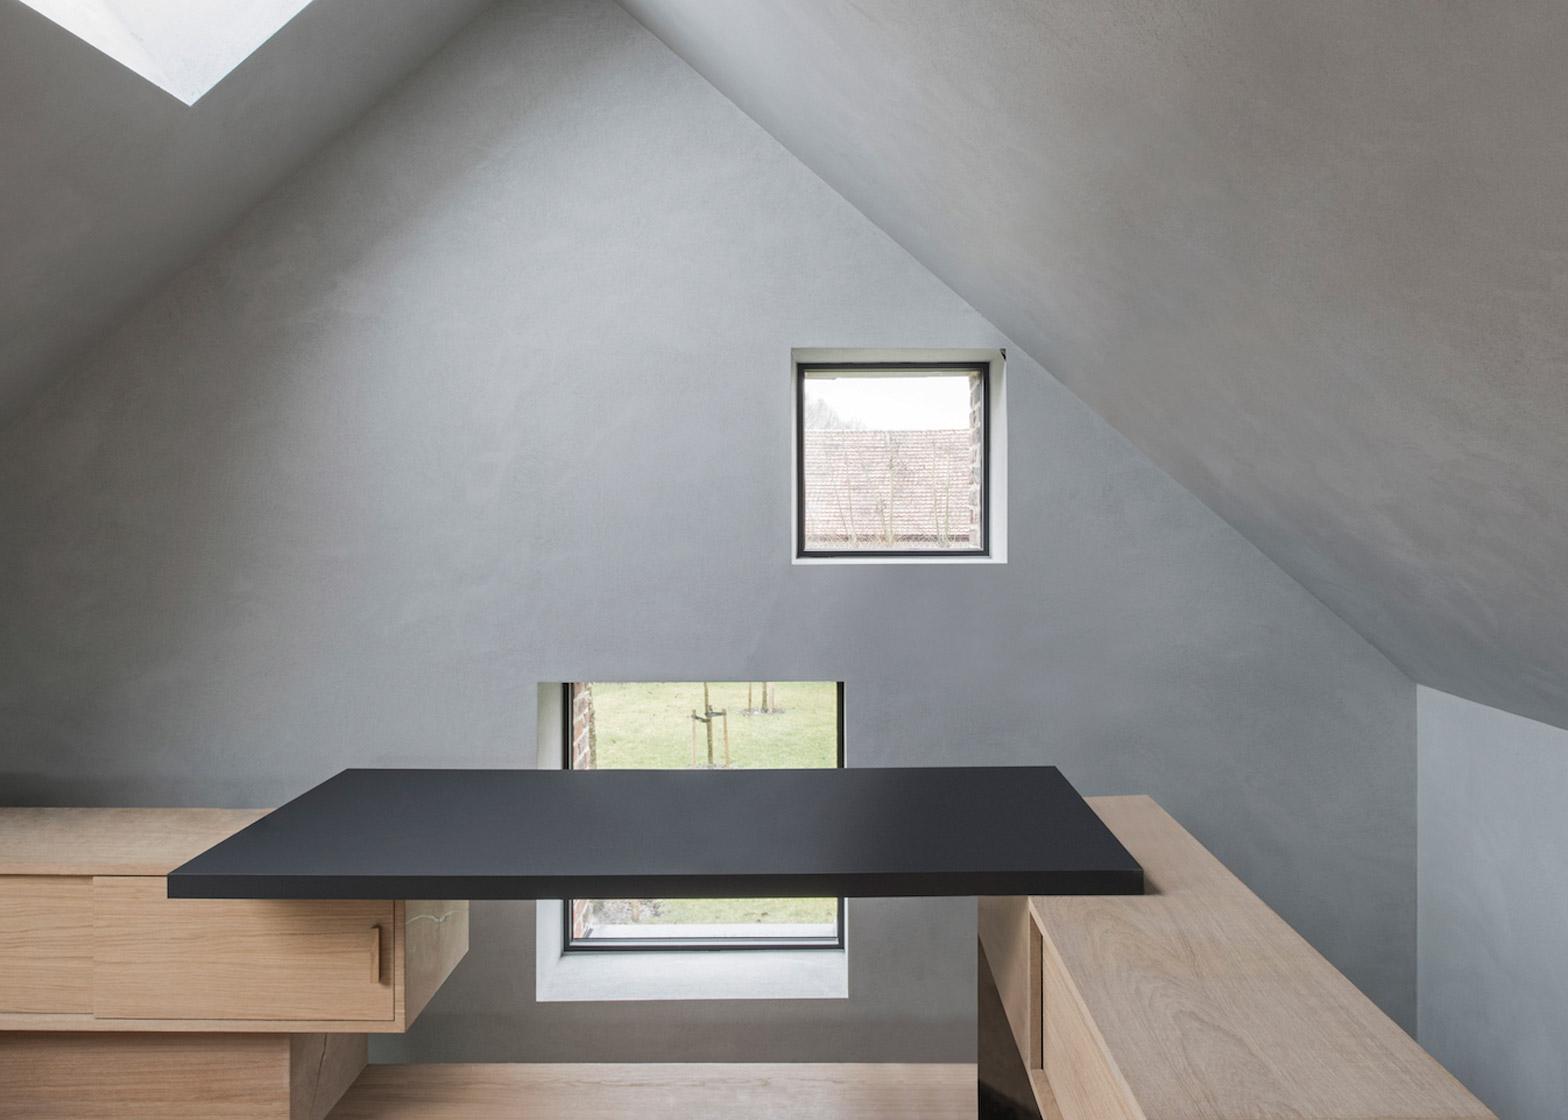 architecture_wood_office_design_studia_interiors_osnovadesign_osnova_poltava_04